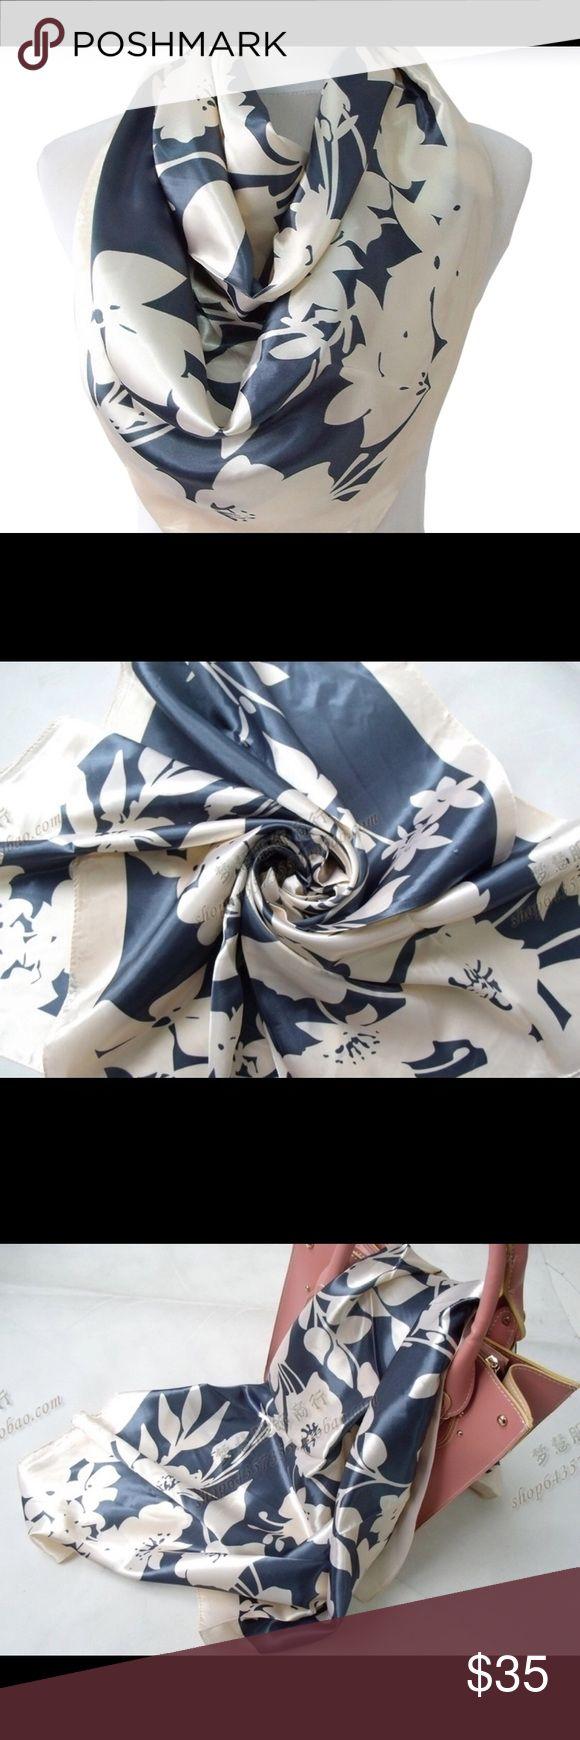 Women's Fashion Silk Scarf Fashion Women Square Silk Scarf Shawl Printed Spring Autumn National Brand Beige Scarves Satin Silk Scarf Wraps Queen Esther Etc Accessories Scarves & Wraps